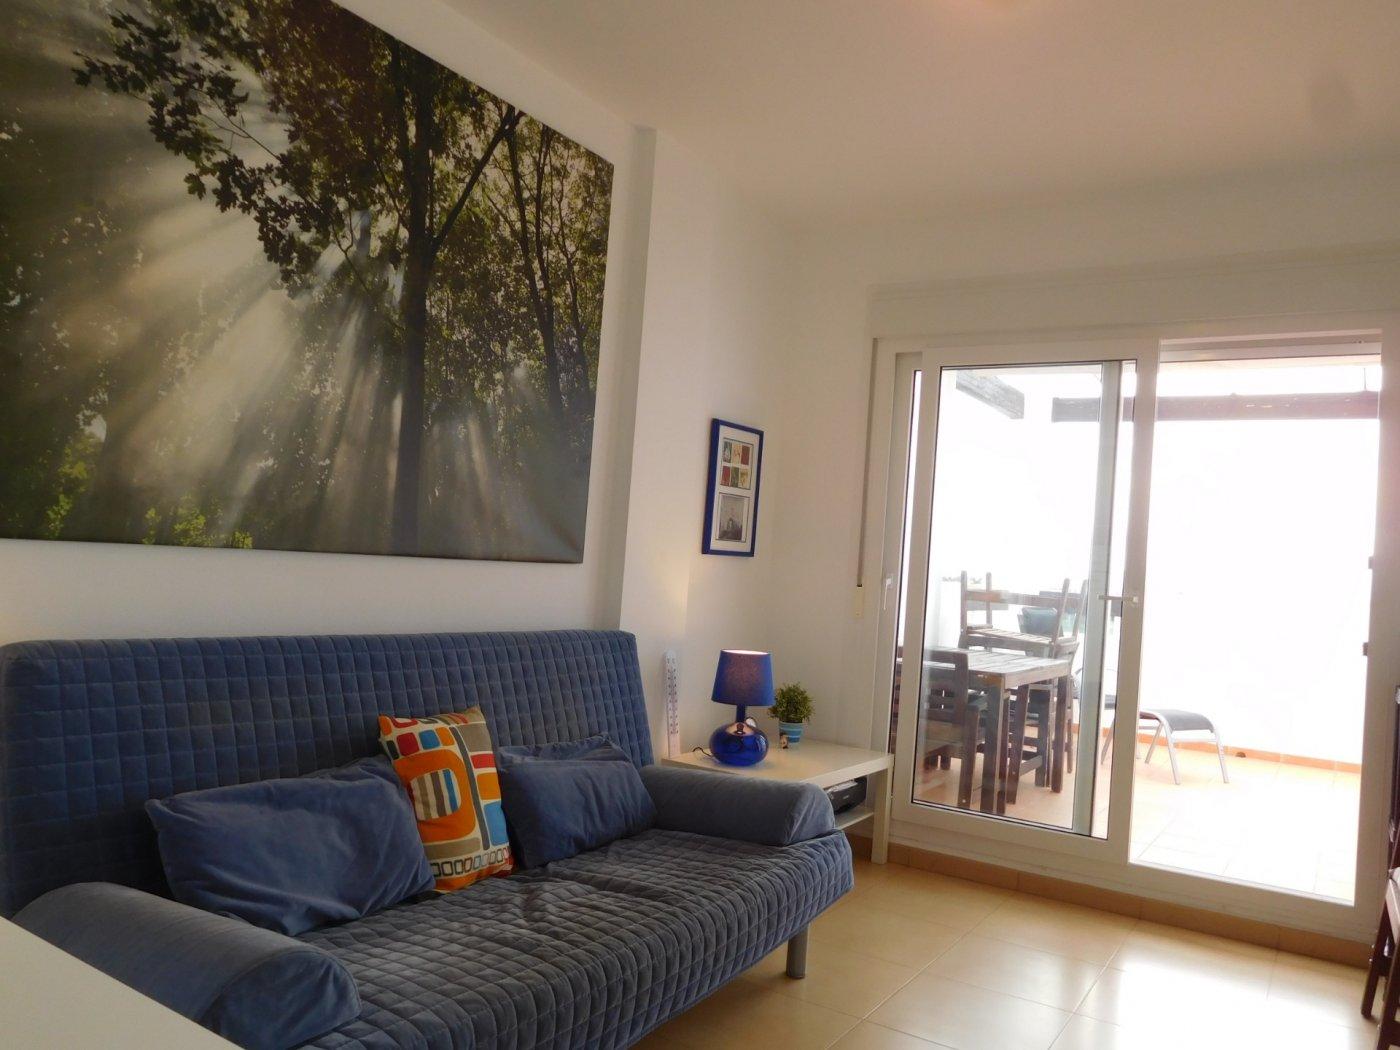 Gallery Image 15 of Apartment For rent in Condado De Alhama, Alhama De Murcia With Pool